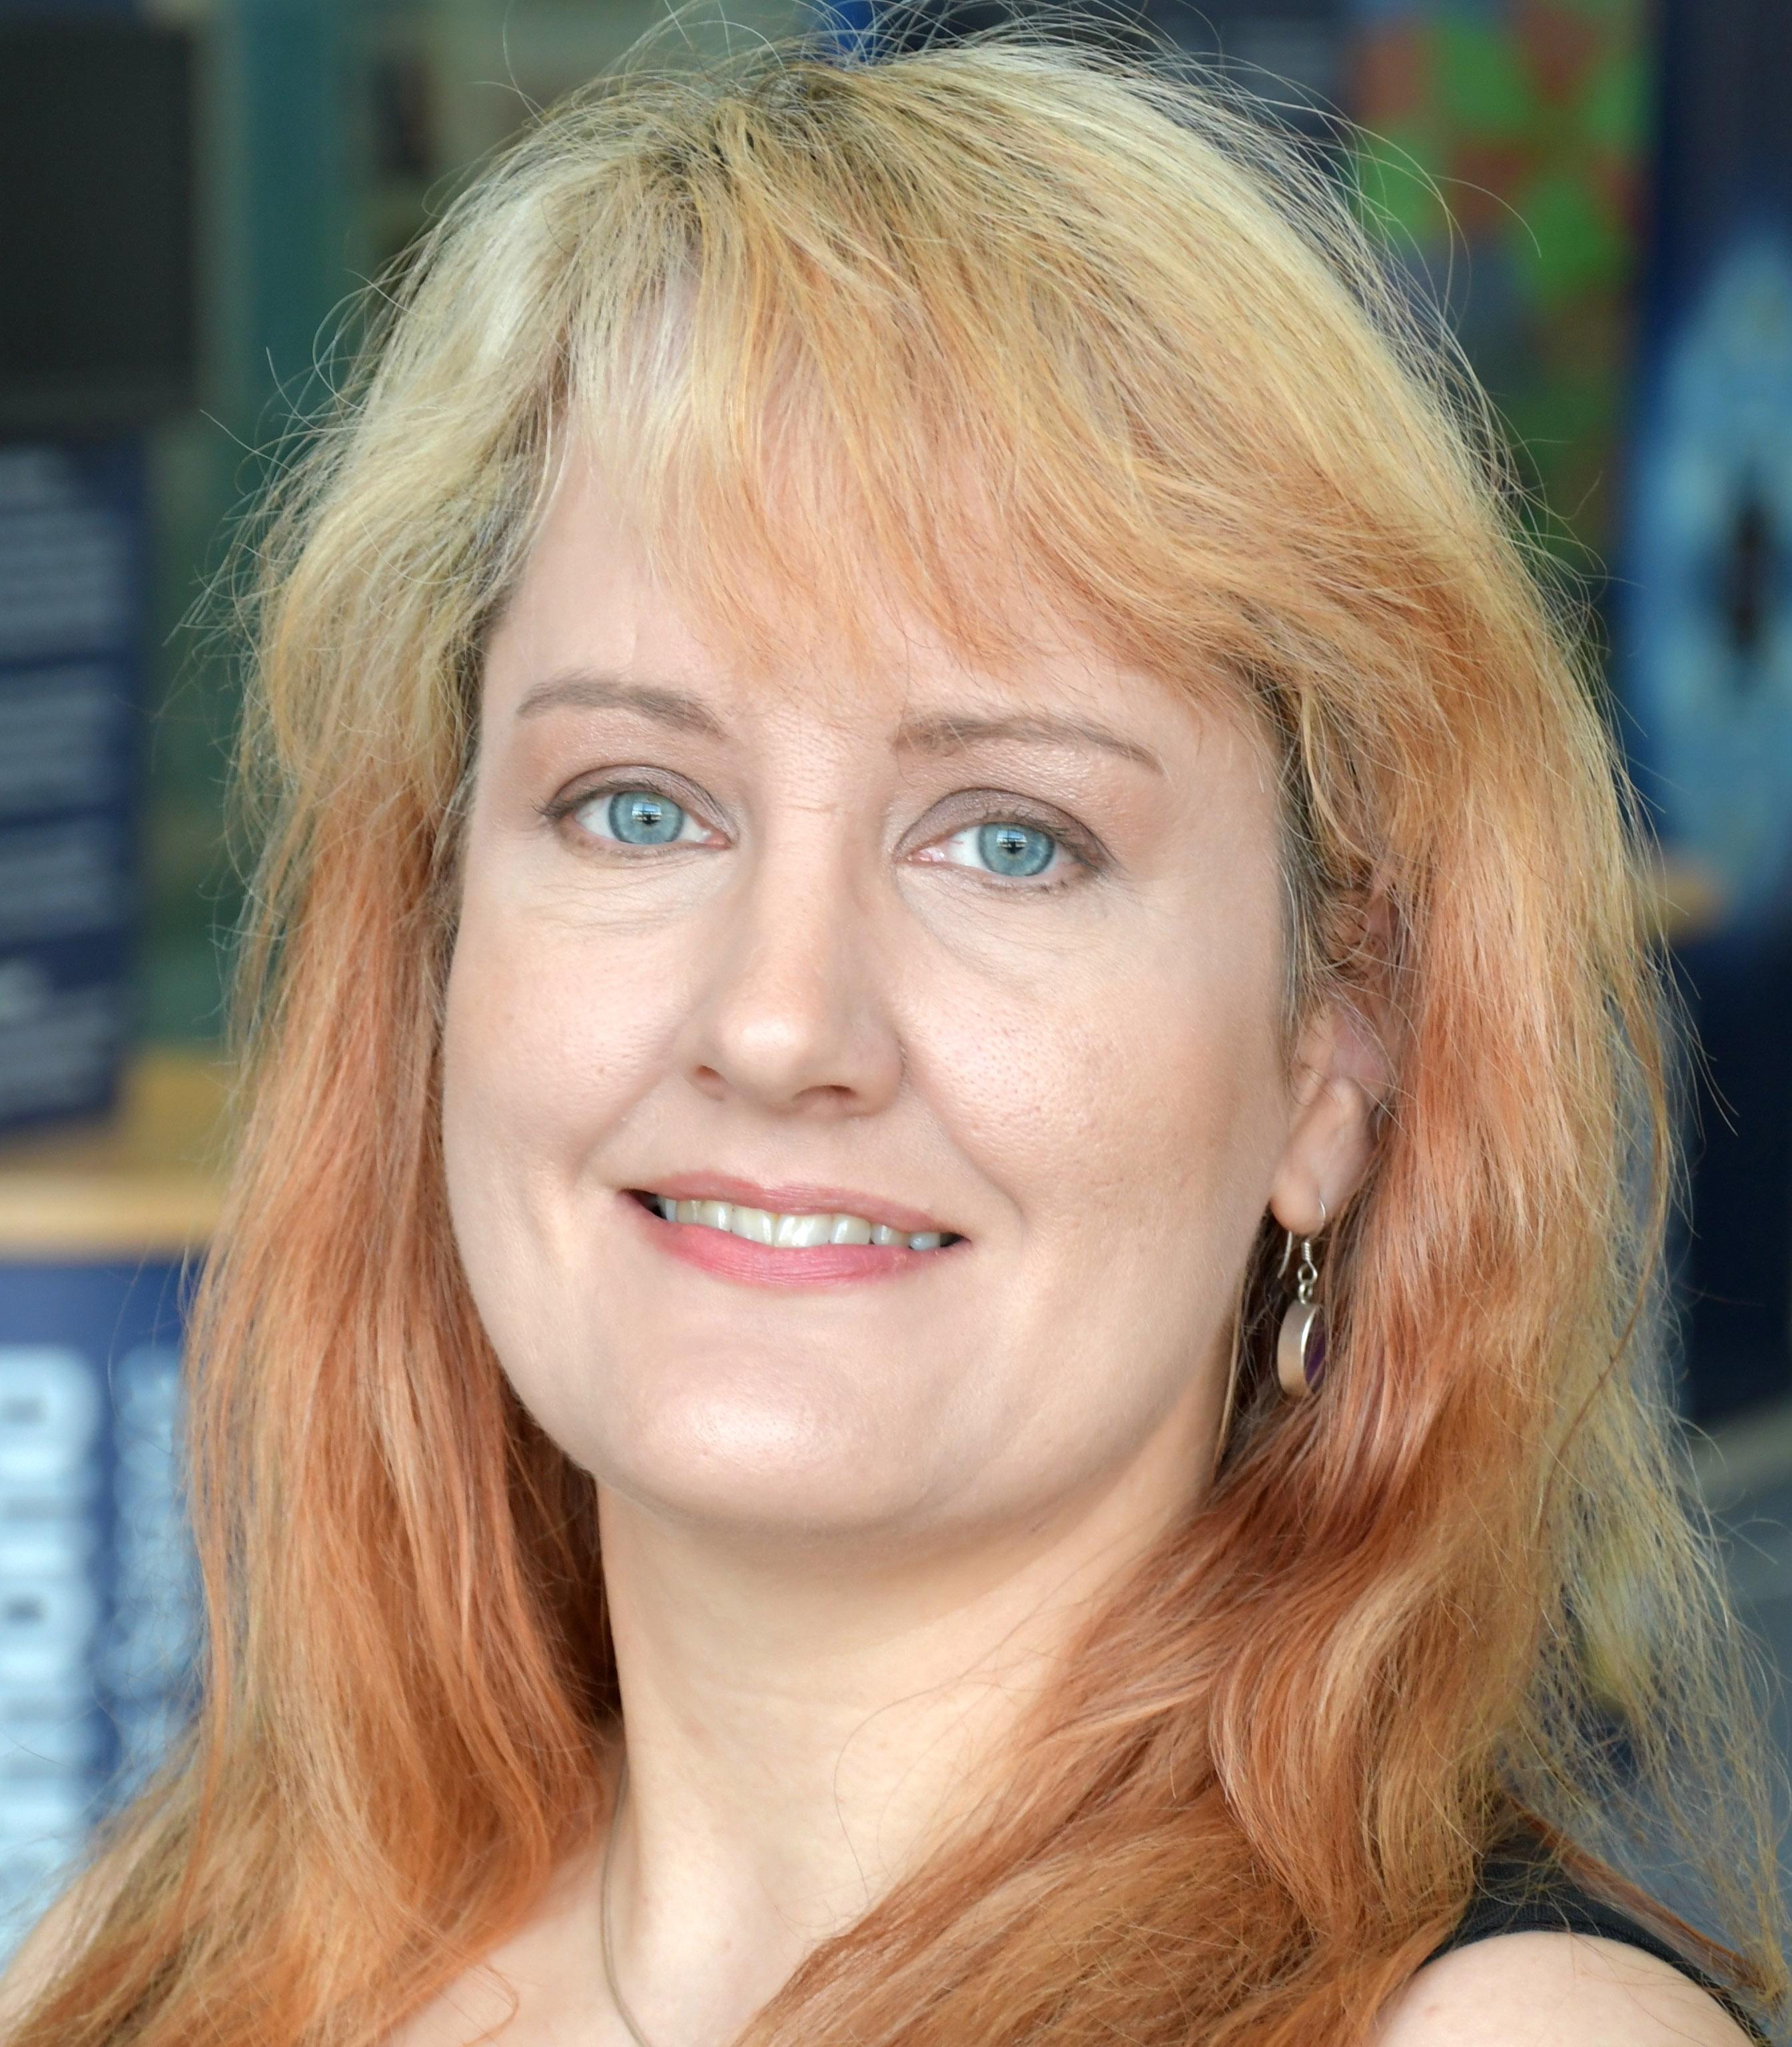 Nicola Harrington